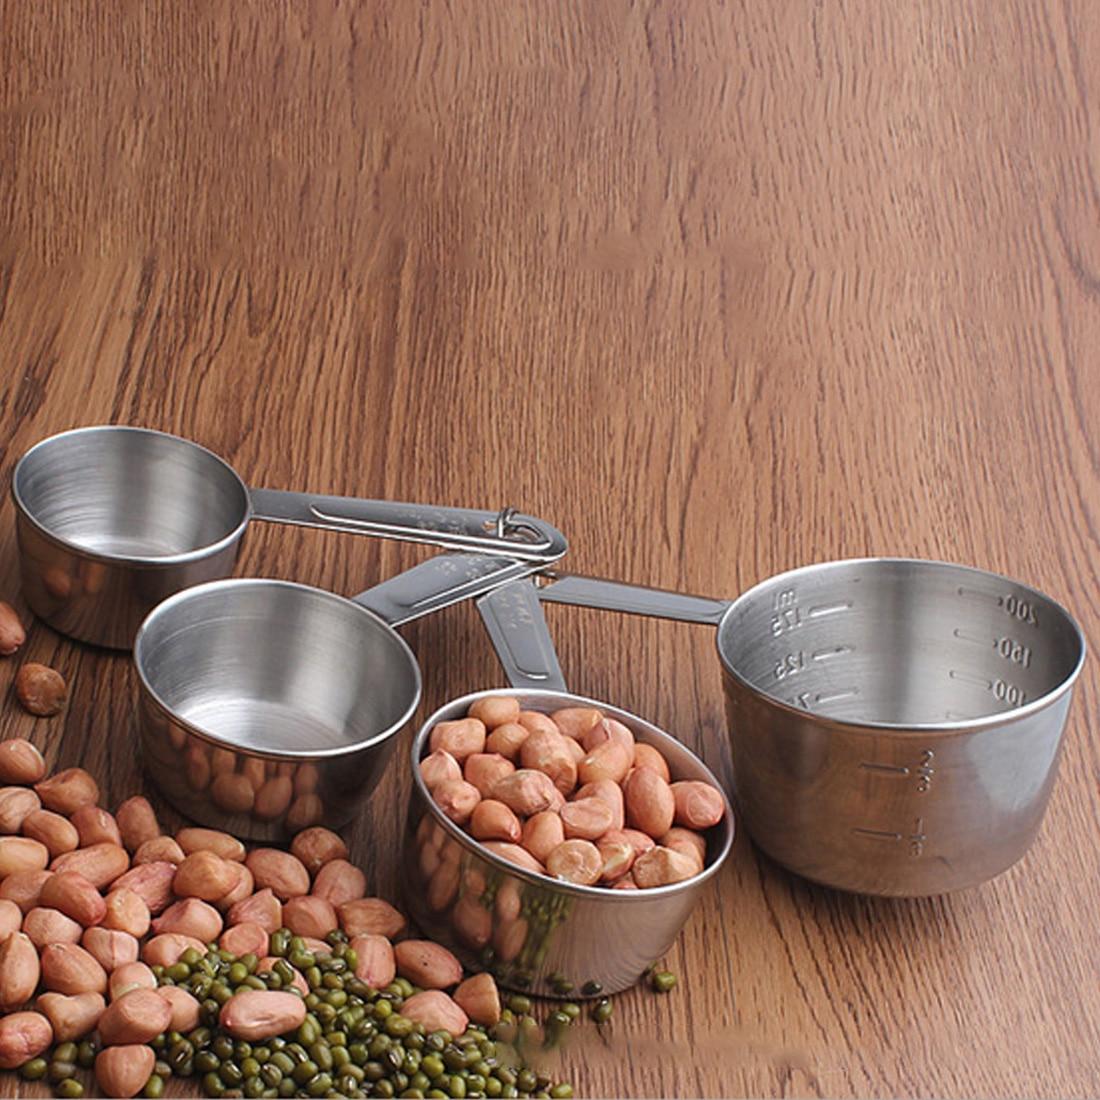 4 Pcs Set Stainless Steel Measuring Cup Kitchen Measuring